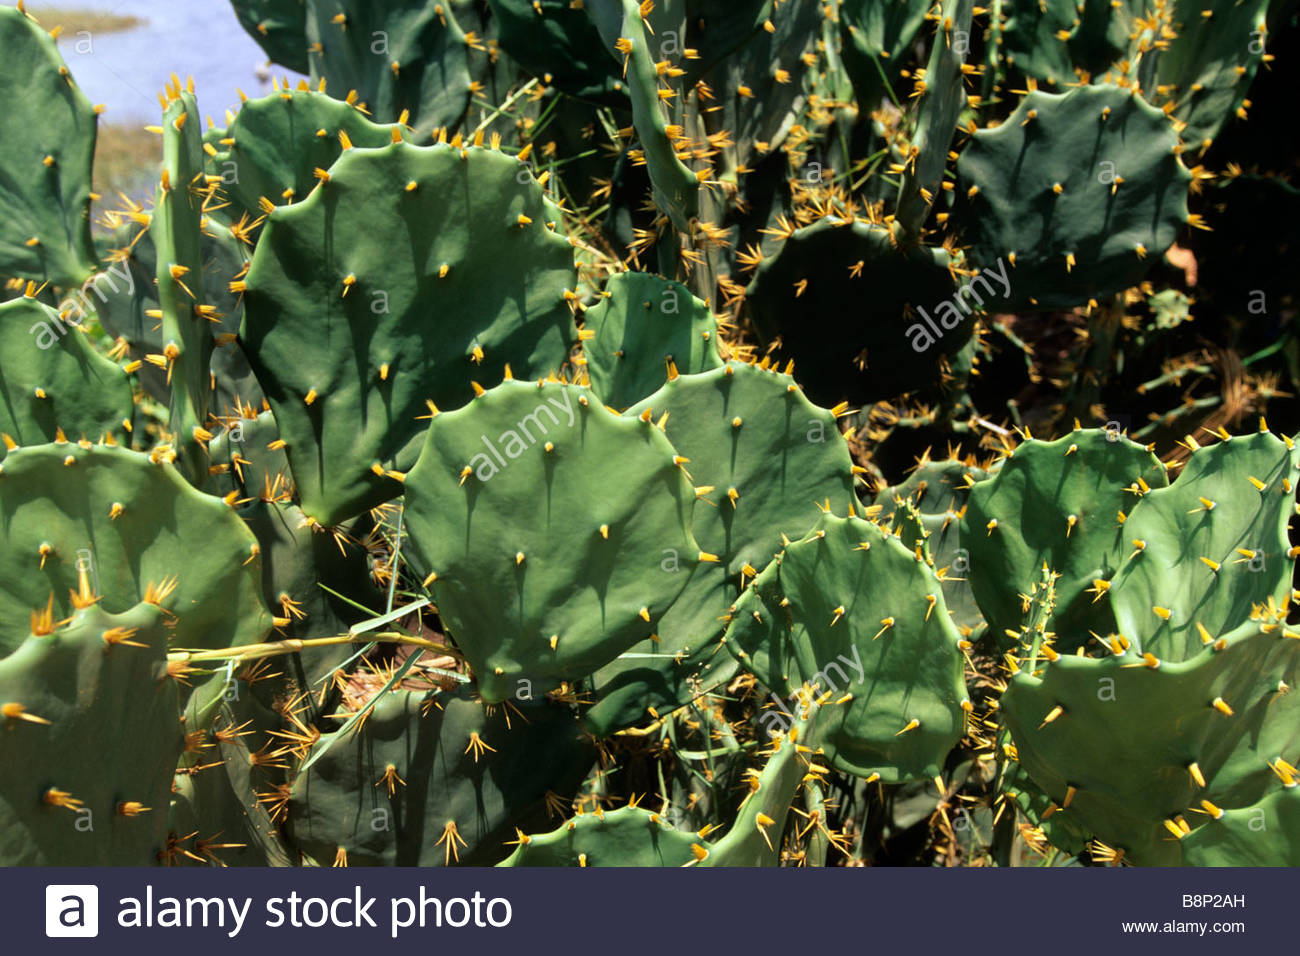 arambepe, cactus, bahia, brazil - Stock Image